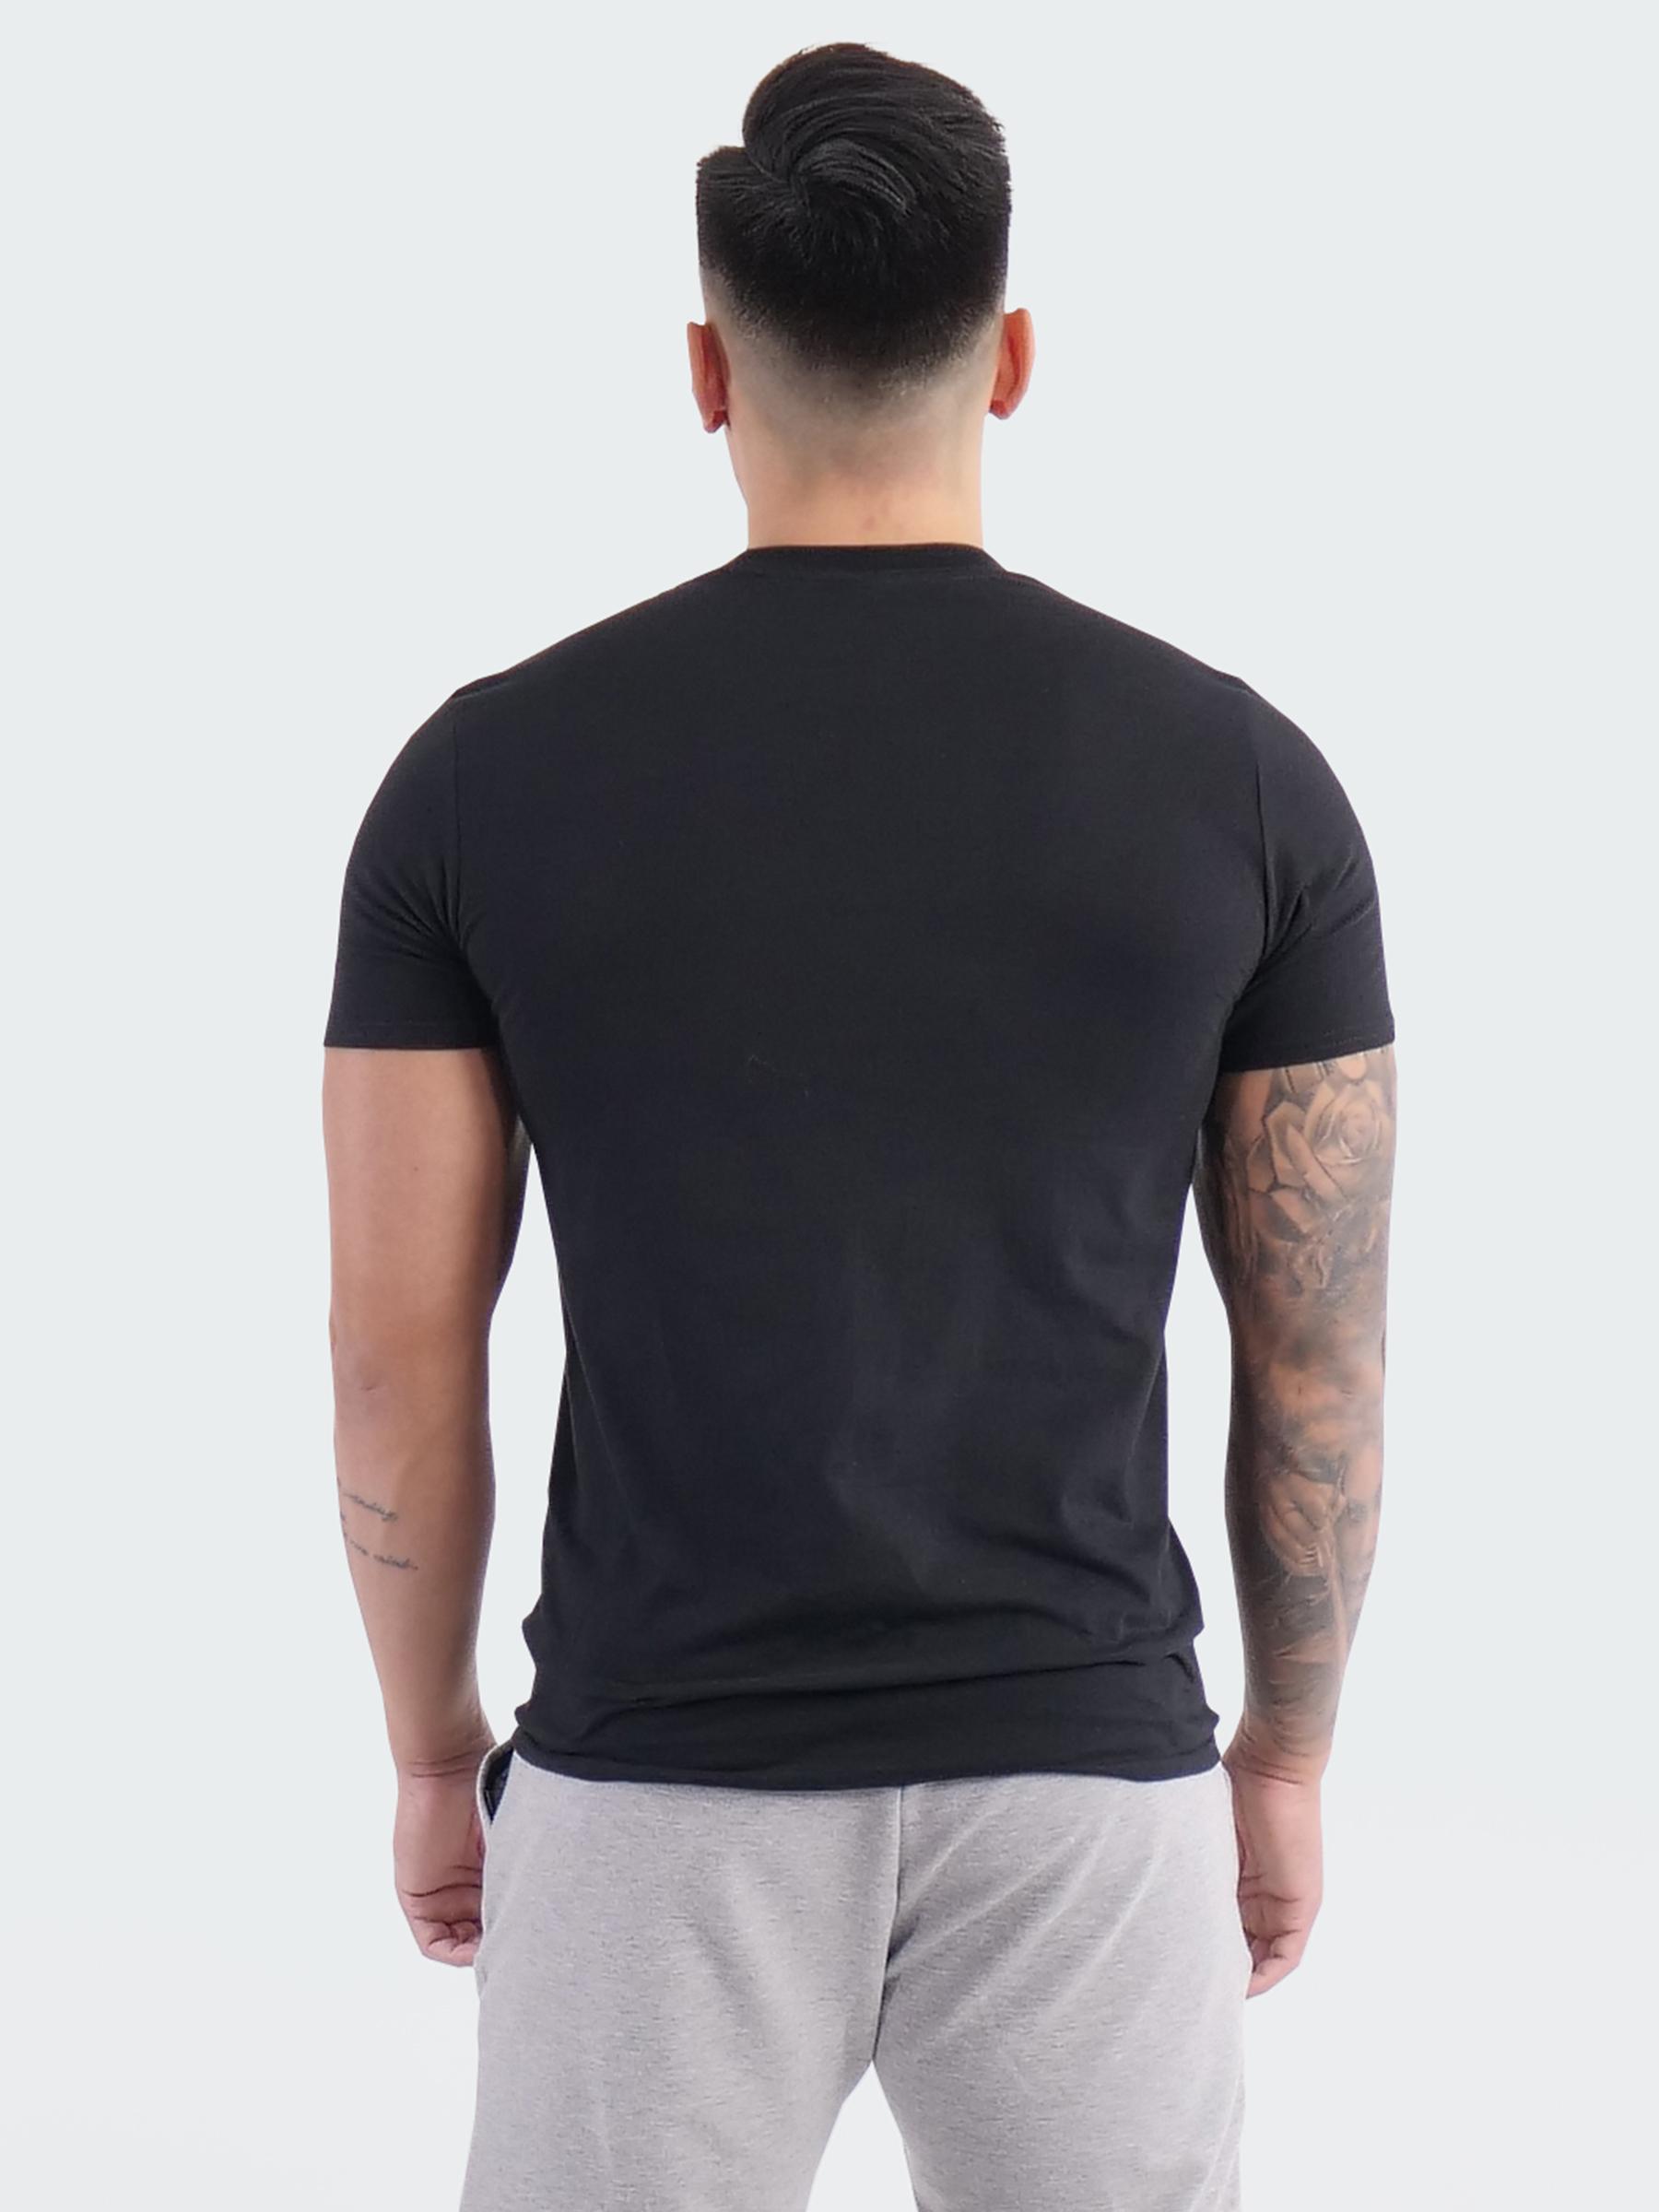 Akta ryggen T-shirt Herr